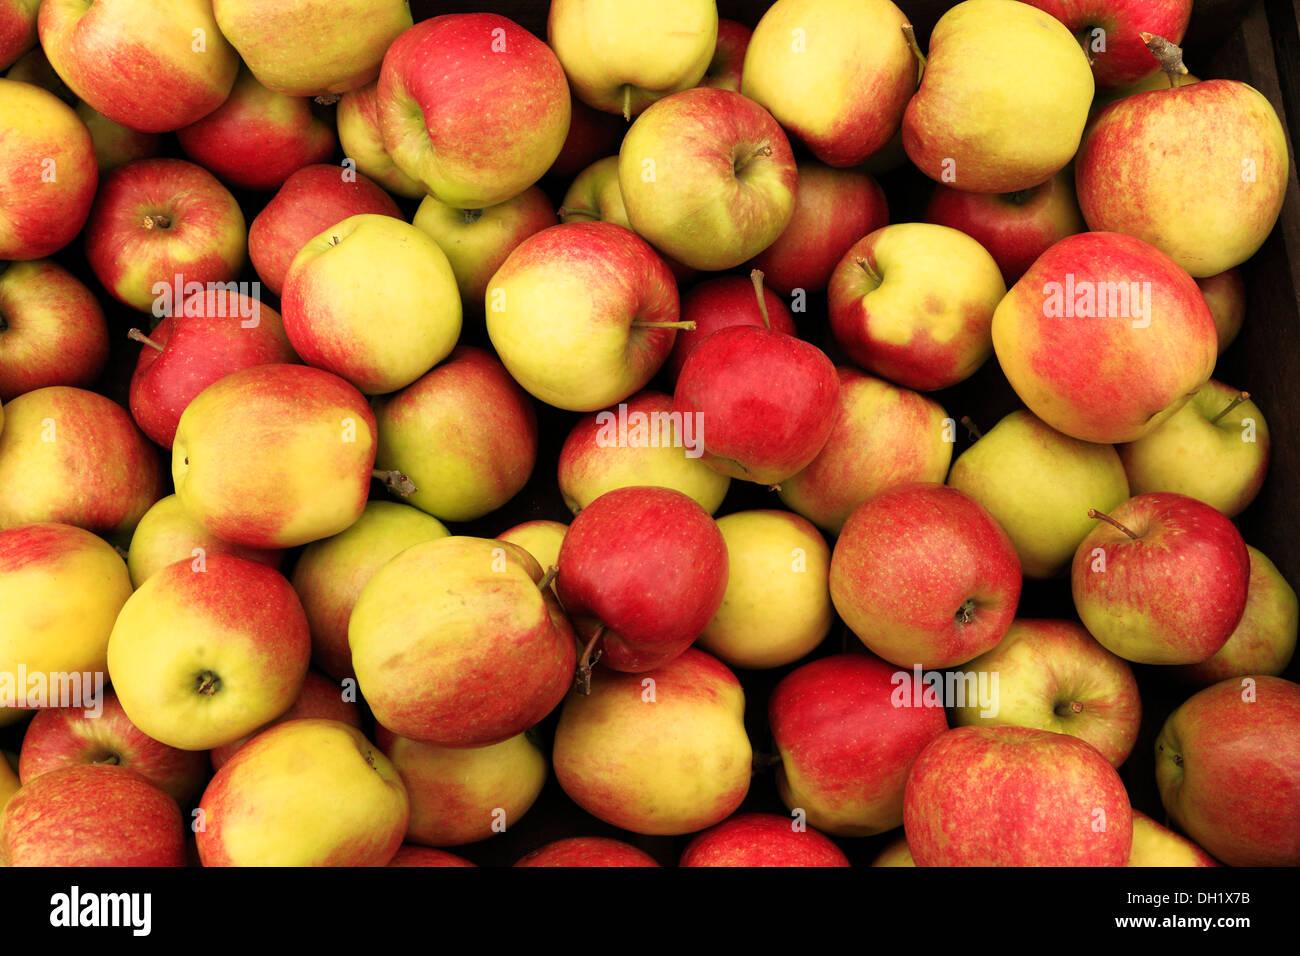 'Apple' Crowngold, Farm shop mostrar, manzanas UK Imagen De Stock